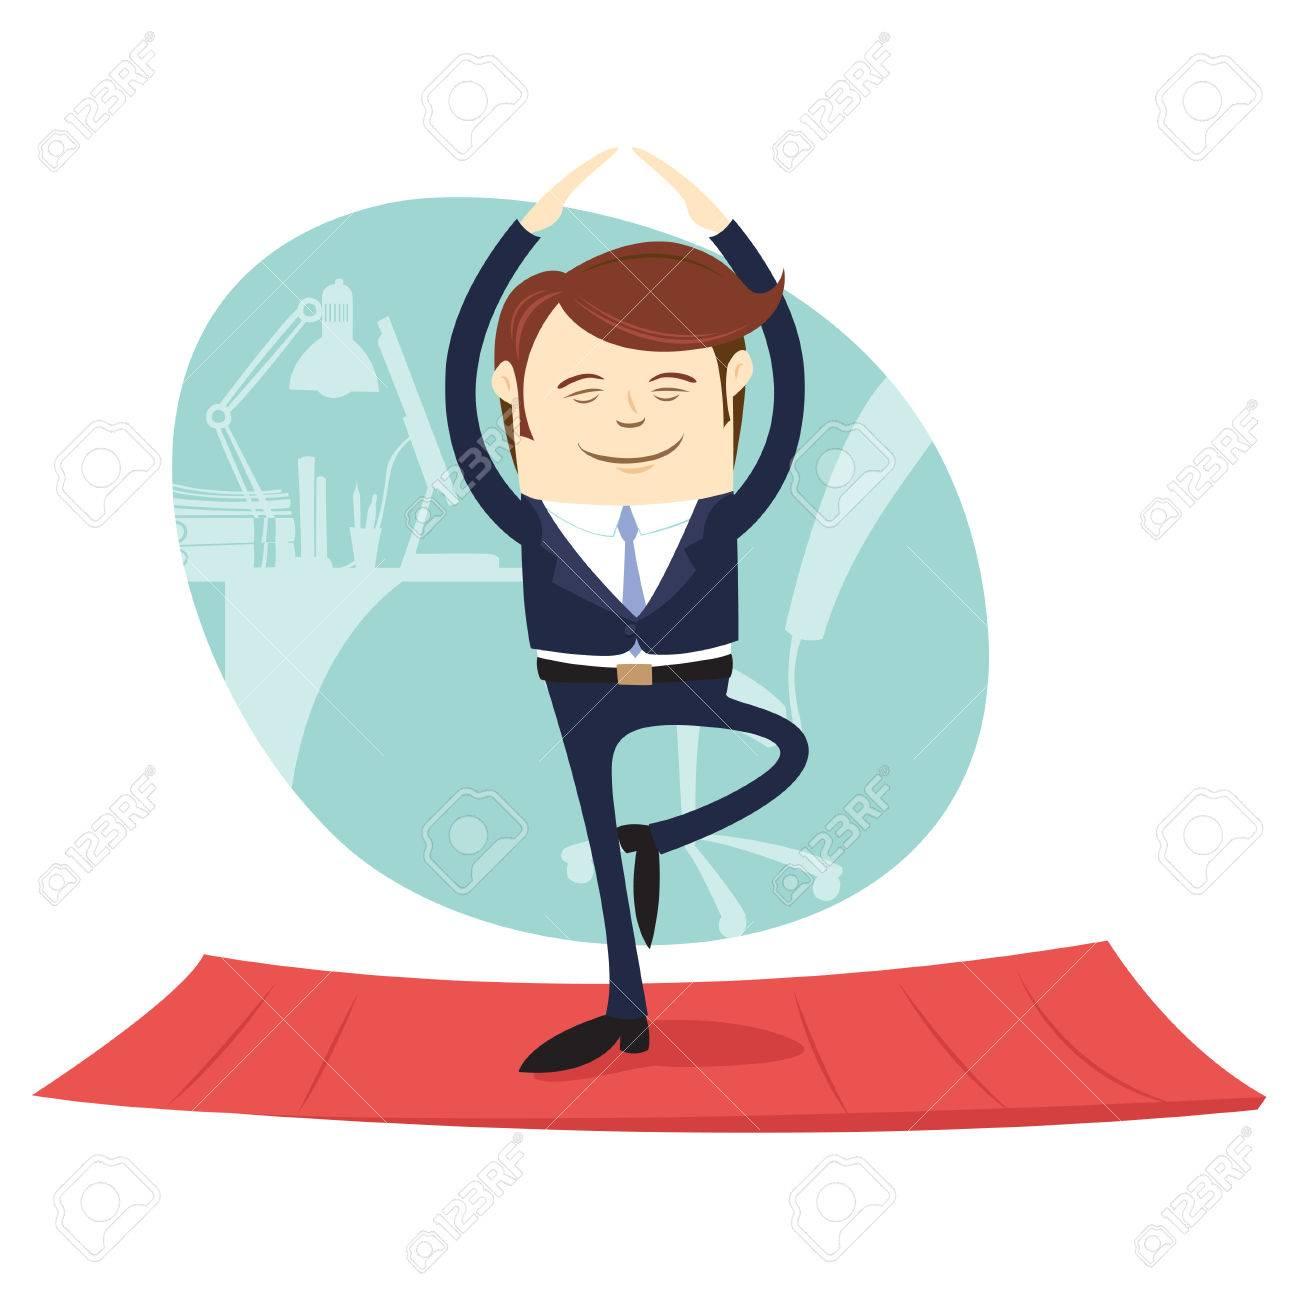 Vektor Illustration Lustige Geschaftsmann Tragen Anzug Tun Yoga